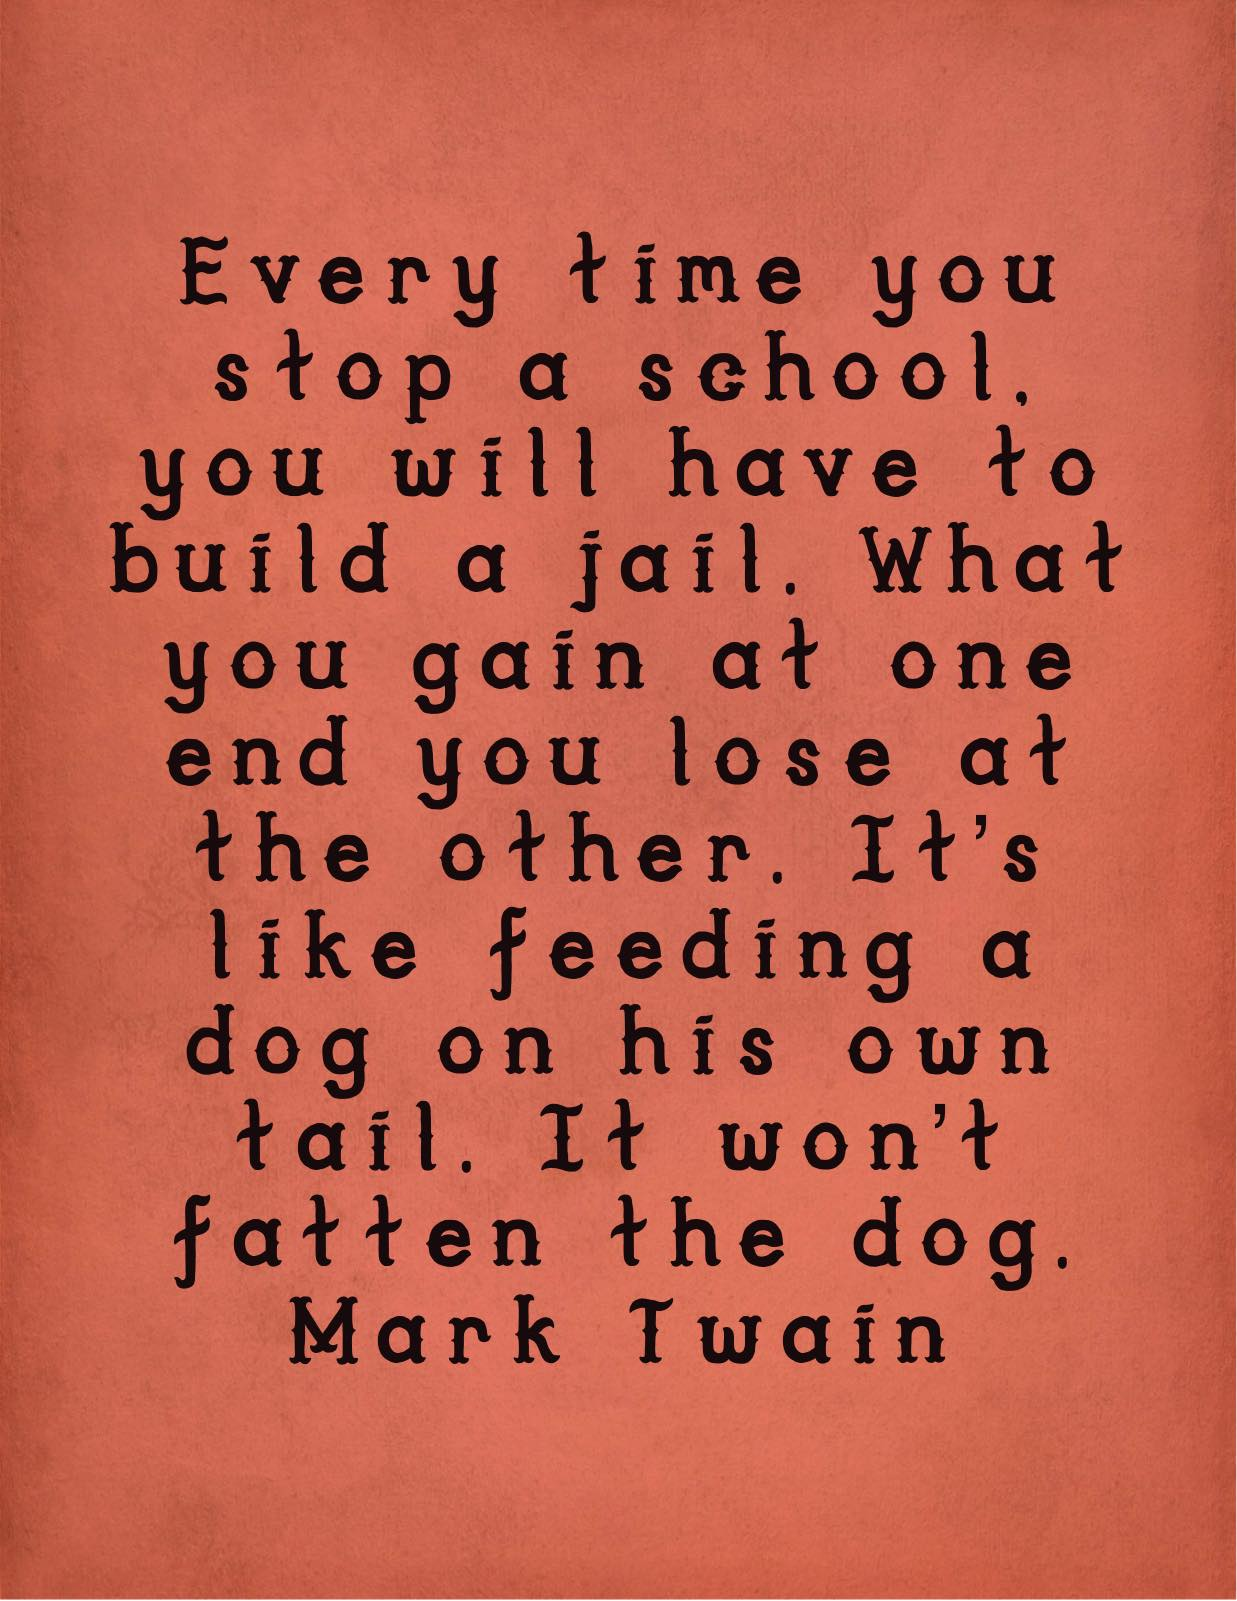 Mark Twain quote education